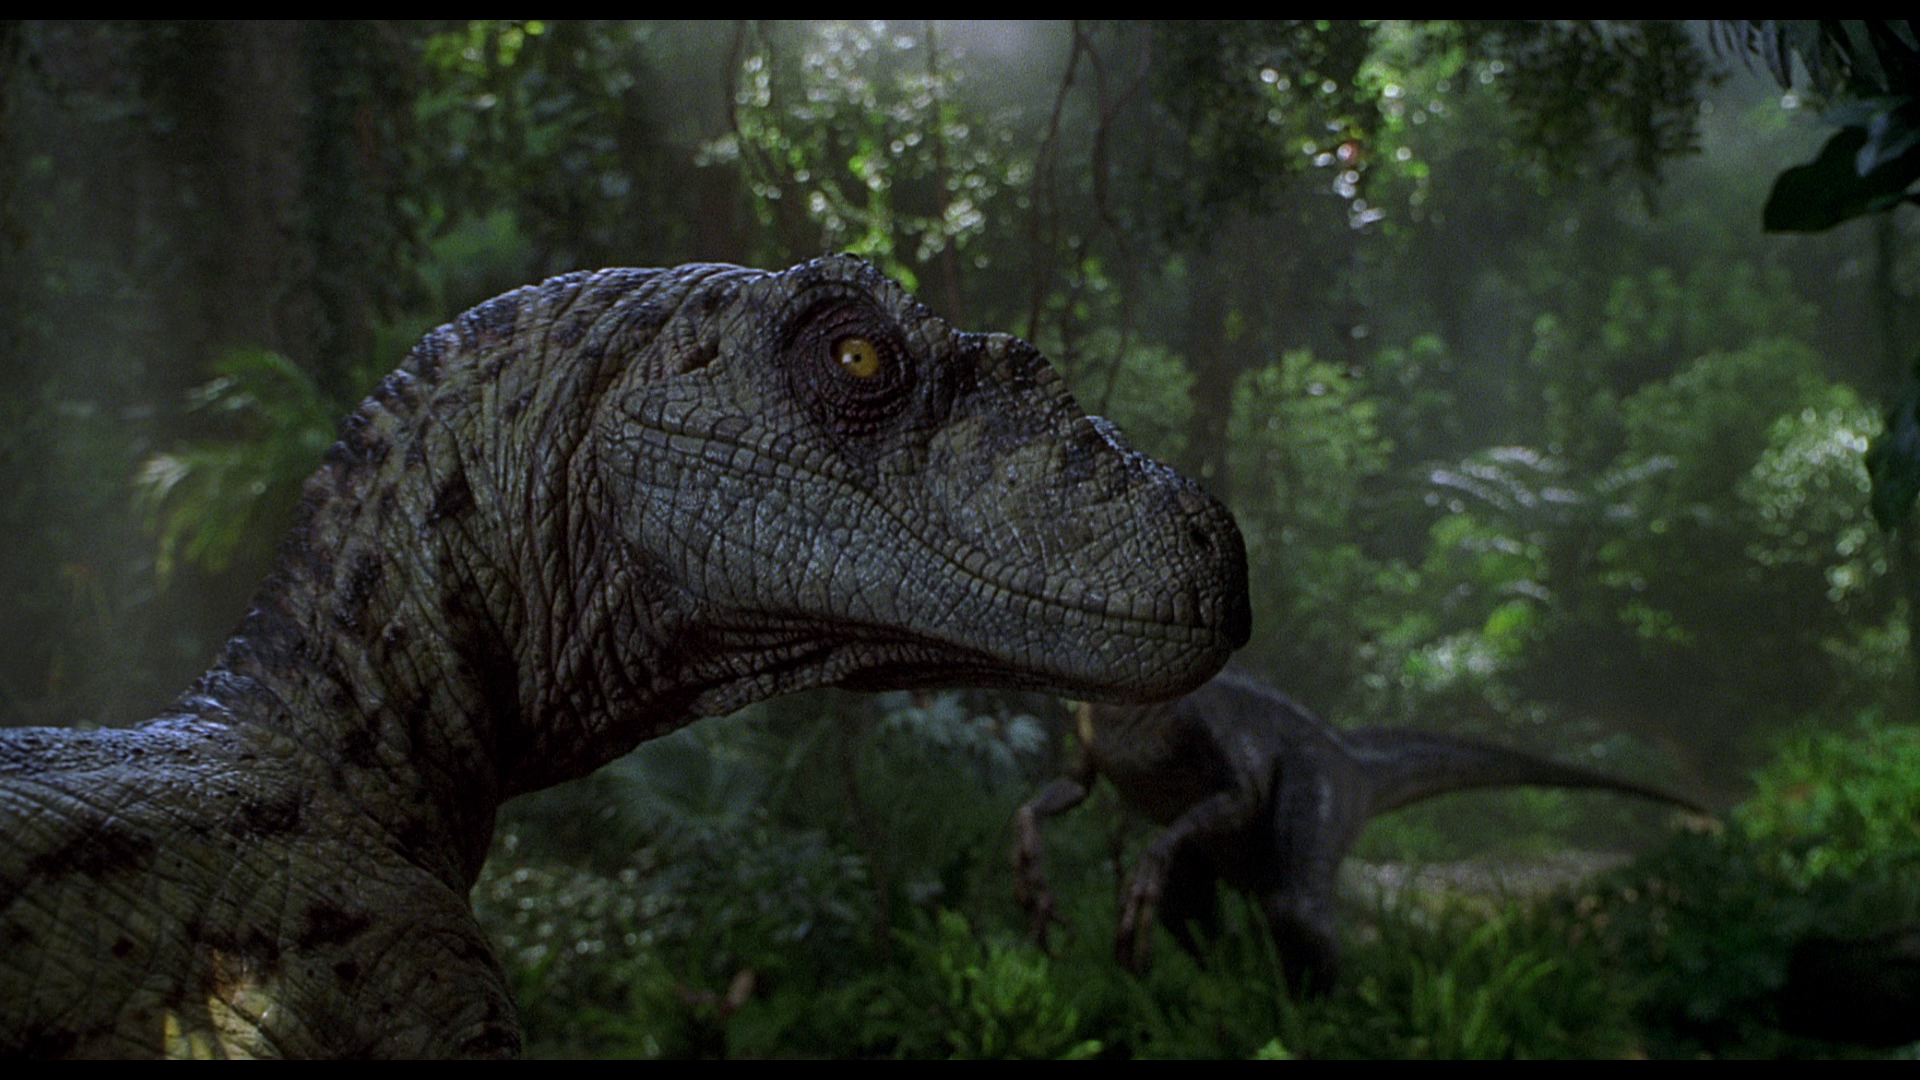 Jurassic Park Wallpaper × Jurassic Park Wallpapers